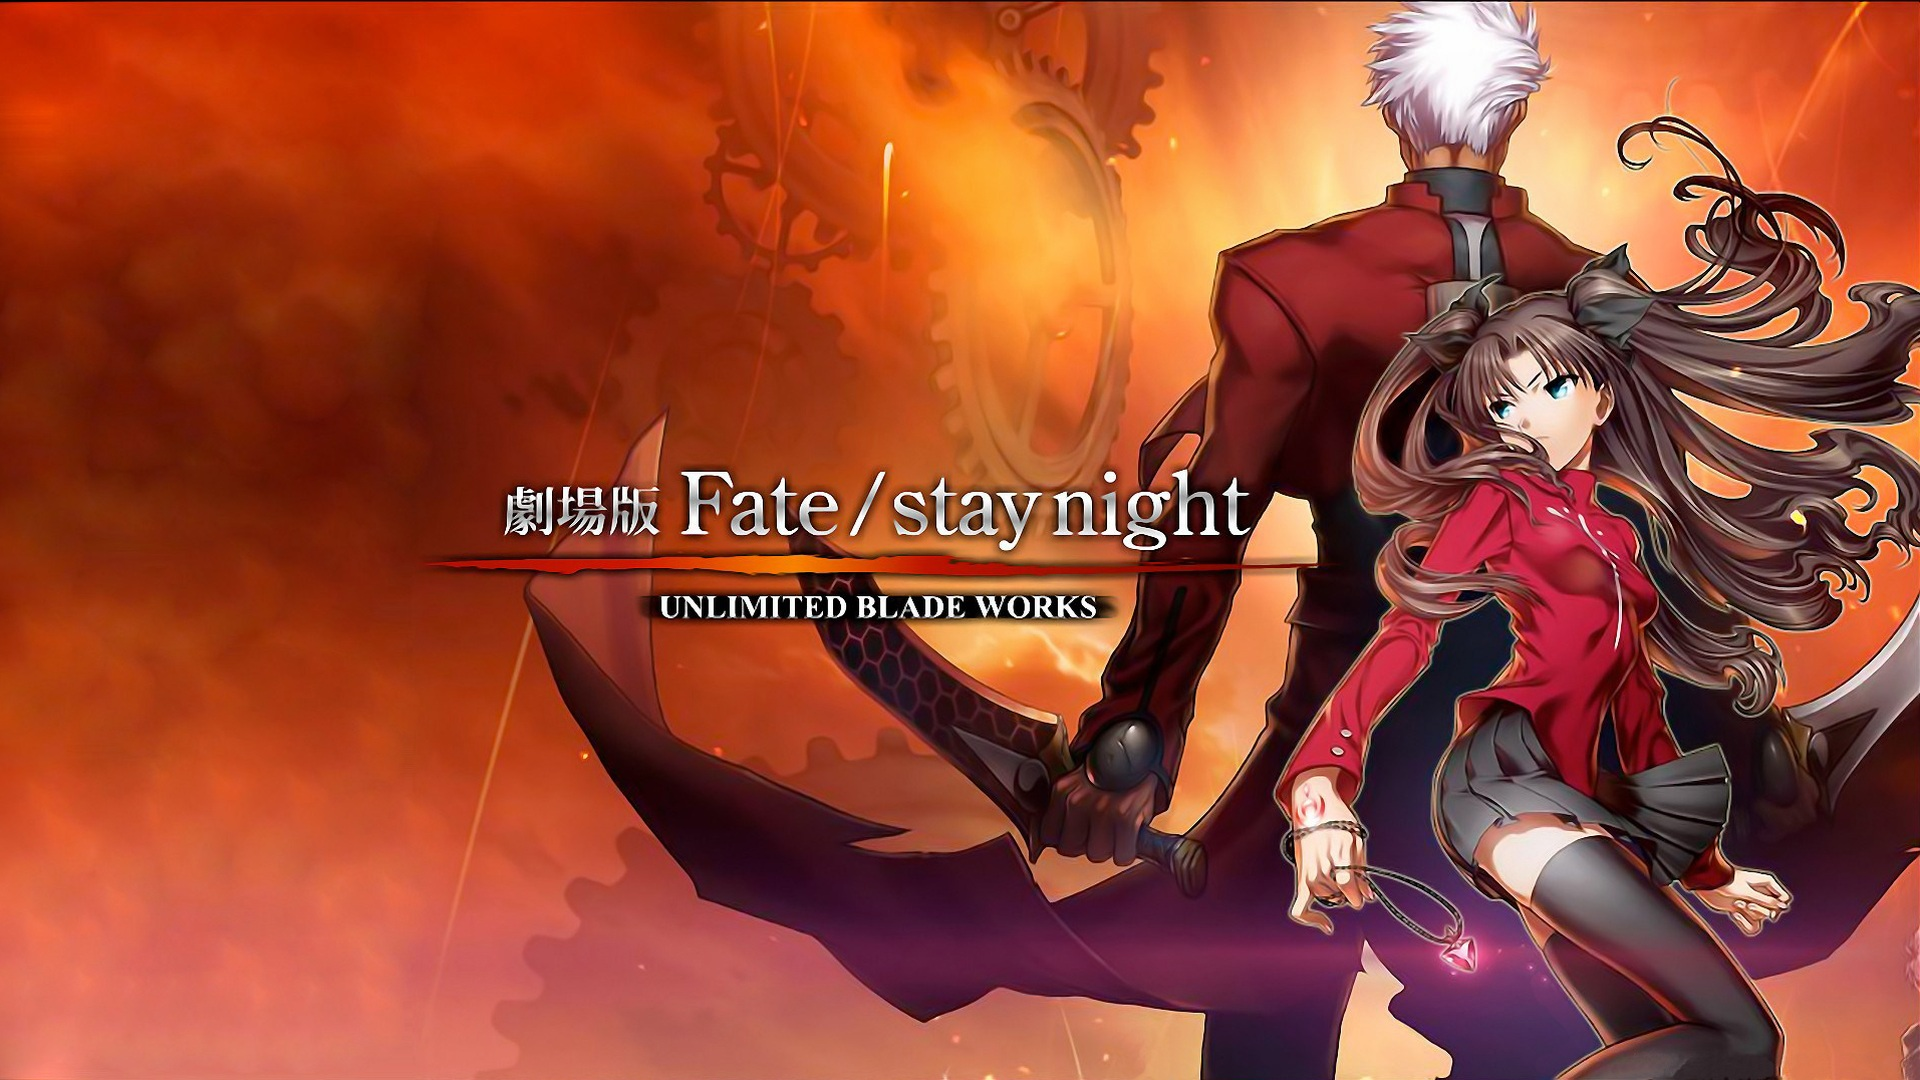 Free Download Fate Stay Night Wallpaper Archer 36 Hd Wallpaper